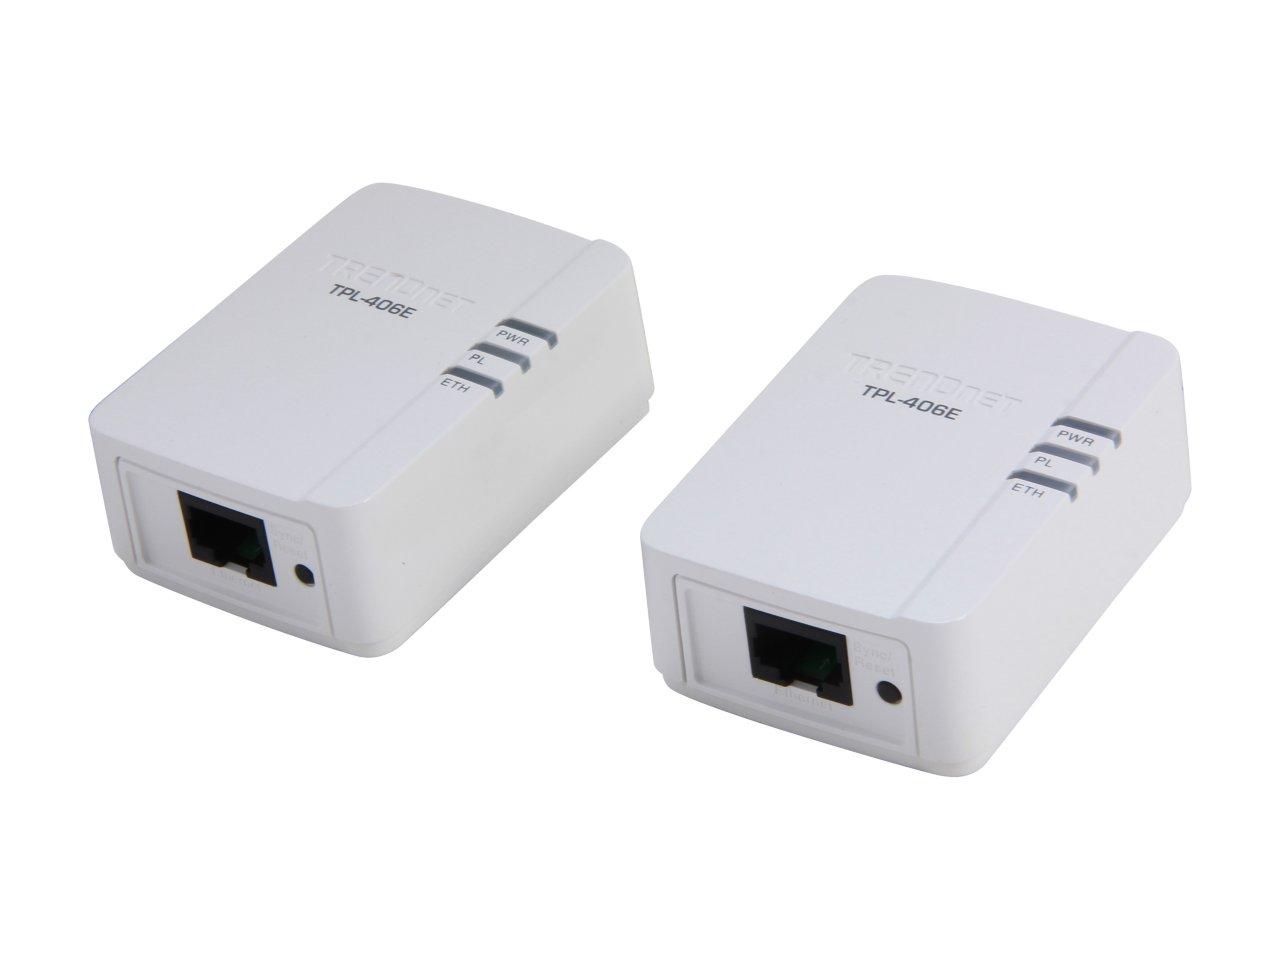 TRENDnet TPL-406E2K Powerline 500 AV Nano Adapter Kit (with 2 Units) for $19.99 AC, Foscam R2 Indoor 1080P FHD IP Camera w/ Night Vision for $107.99 AC & More @ Newegg.com